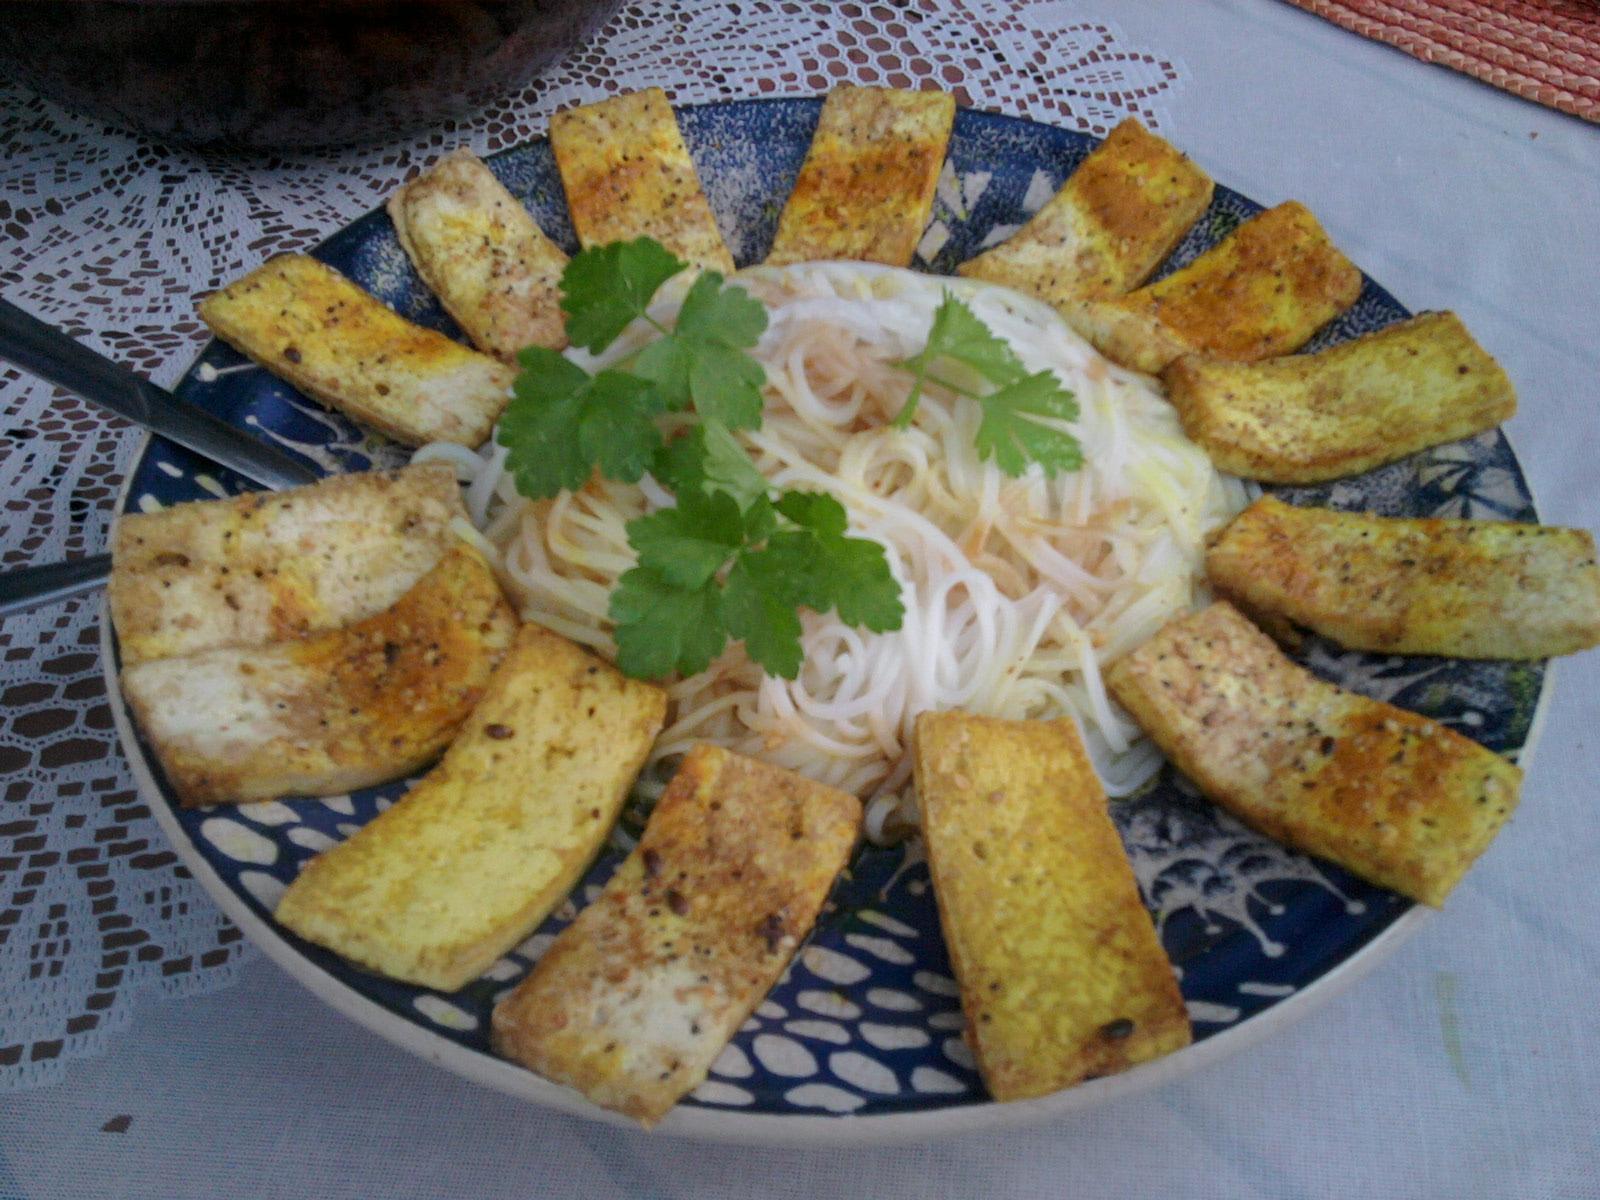 meals_gormet tofu rice noodles